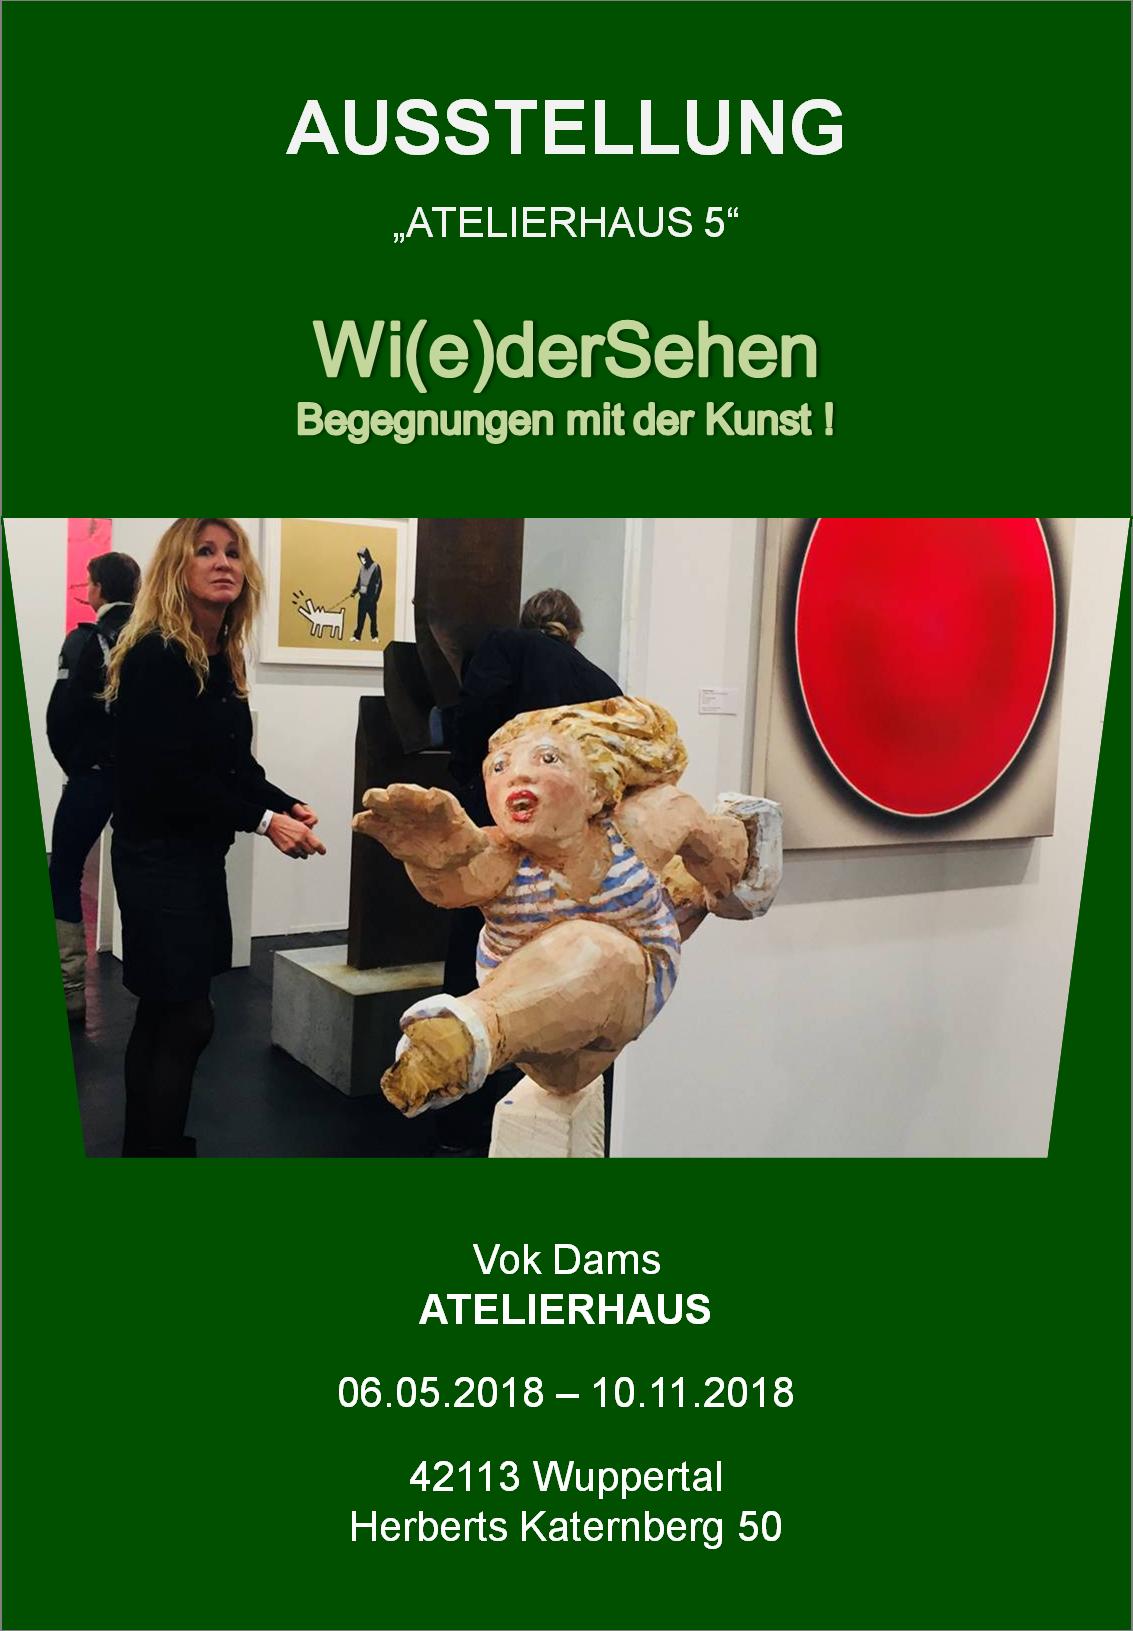 18-04-03 Ausstellung  Wi(e)dersehen Plakat-Bild